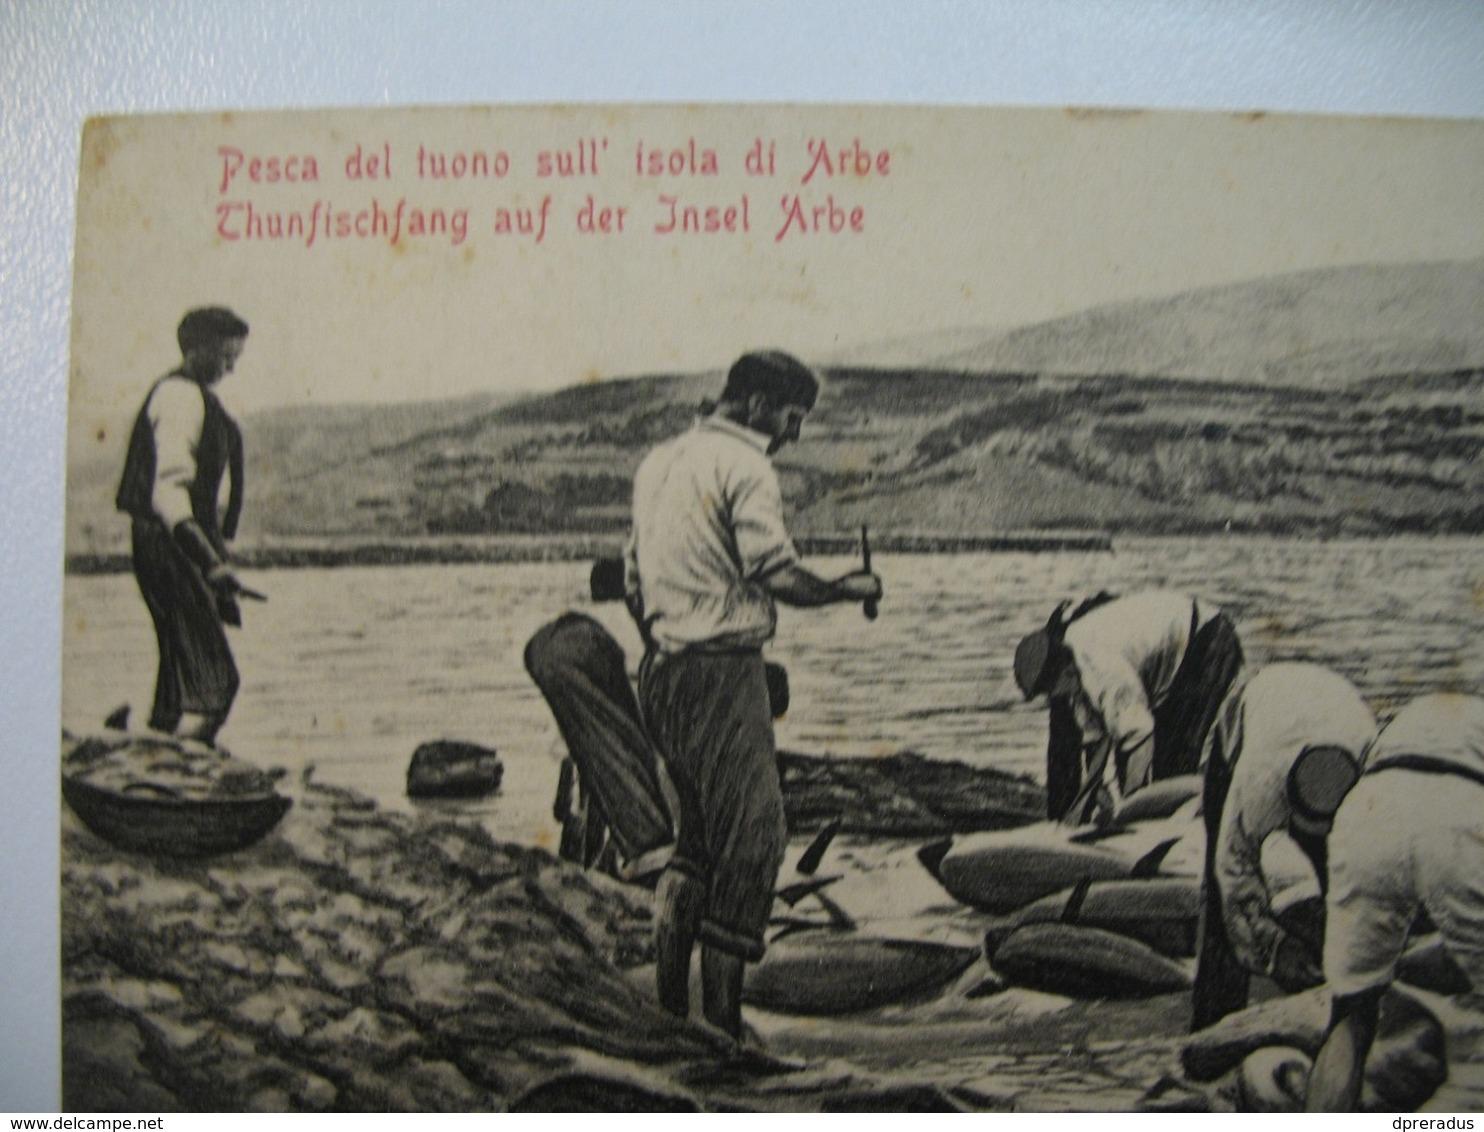 Croatia Arbe Rab Fischer Thunfischang 1924. Fish Ship Post SUSAK - Croatia